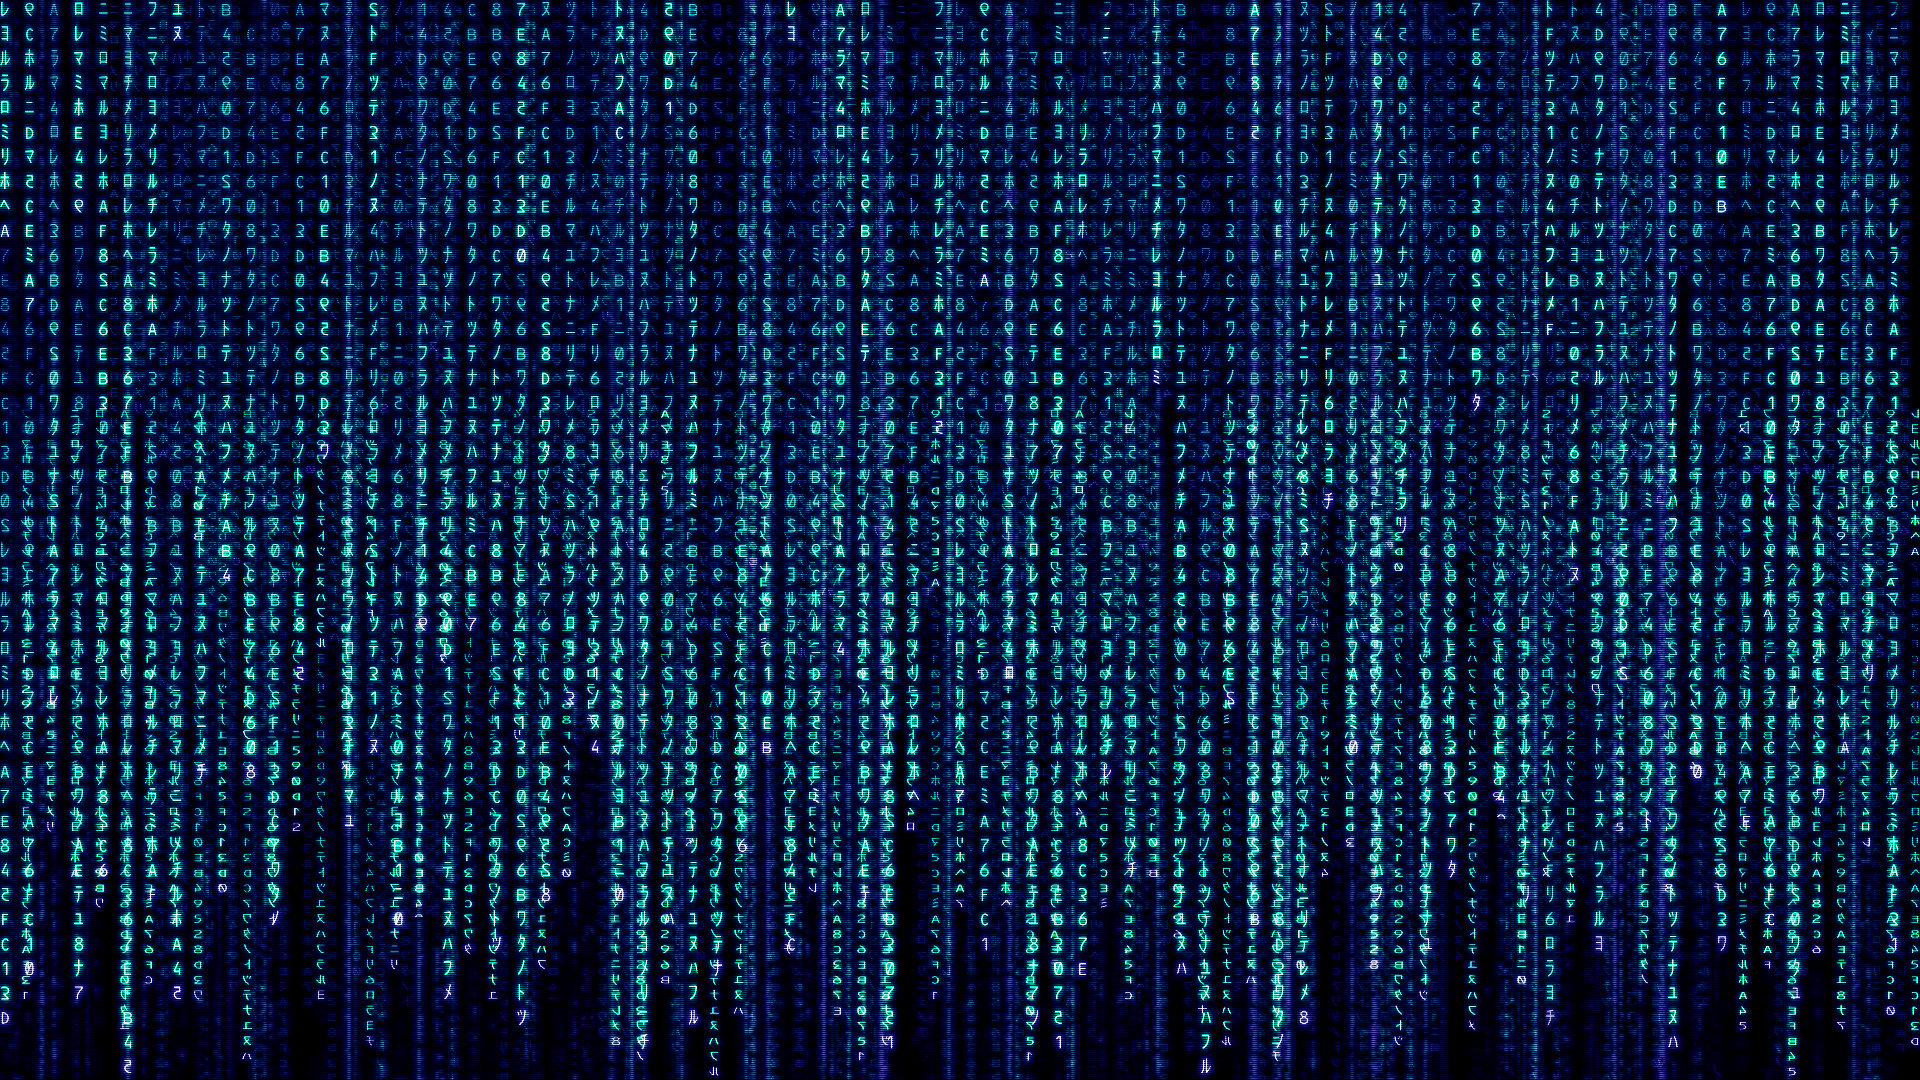 Blue Matrix Code Wallpapers Blue Matrix Code Myspace Backgrounds 1920x1080